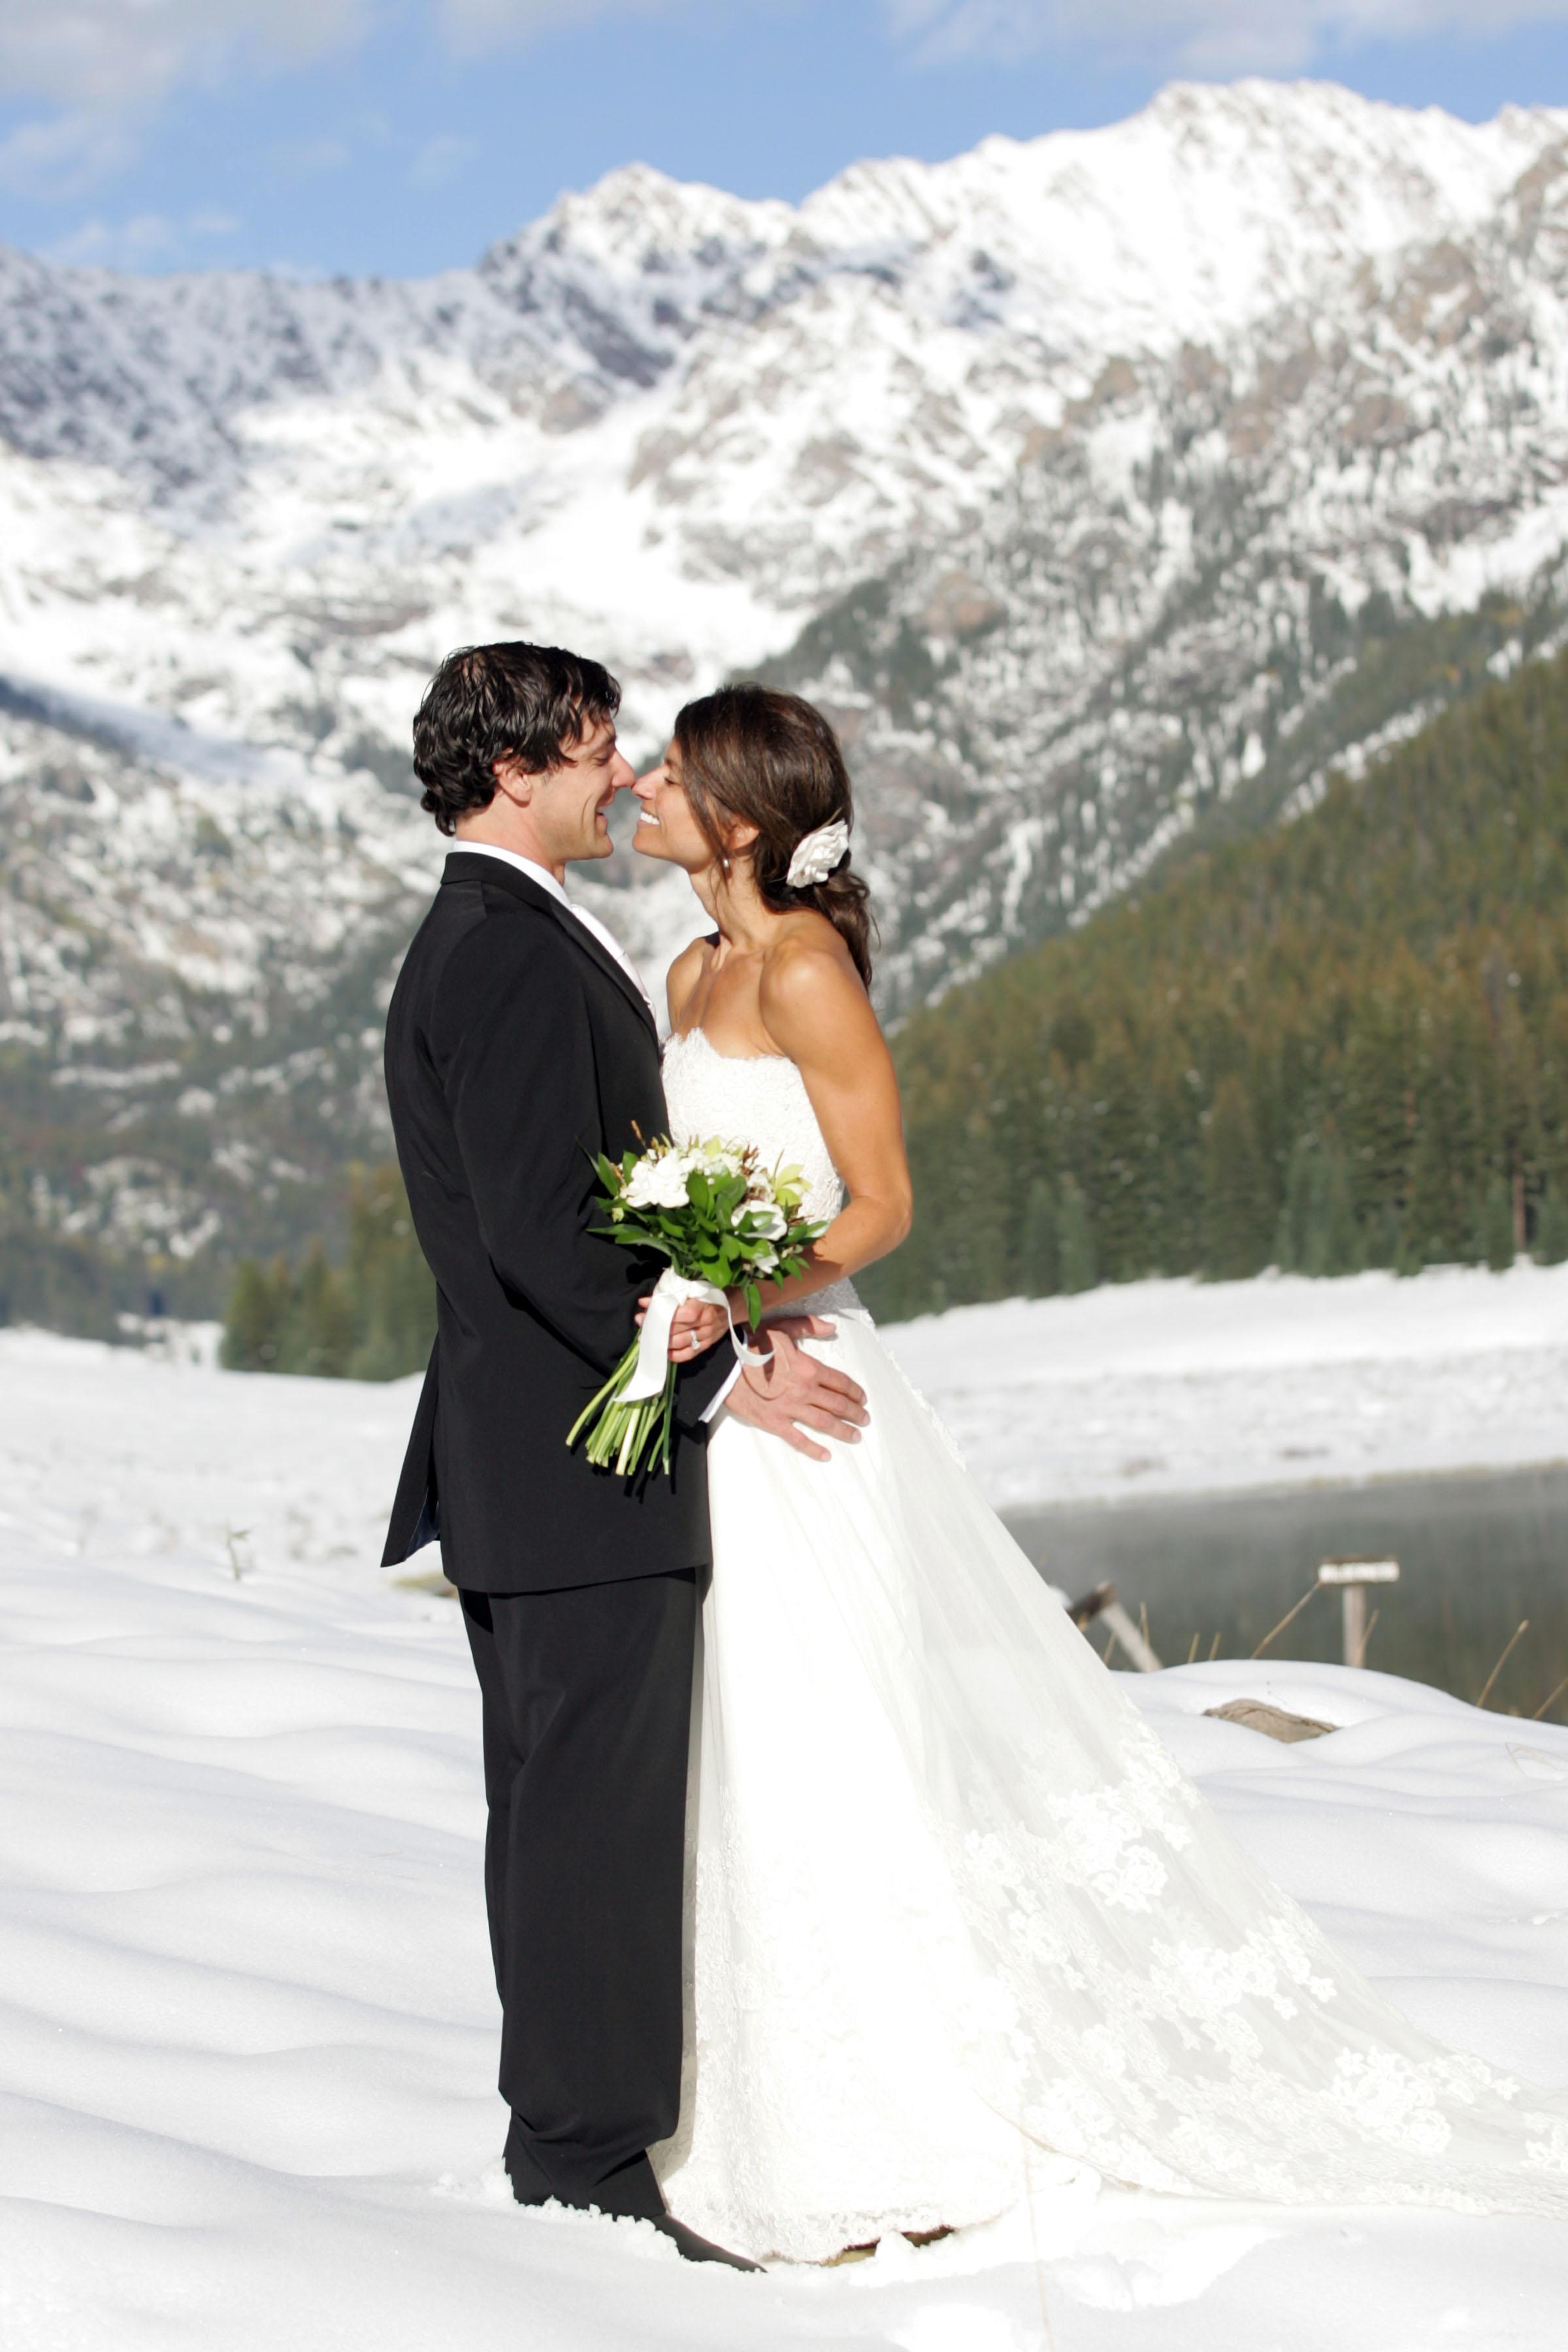 Sonnenalp-weddings-vail-axelphoto.jpg